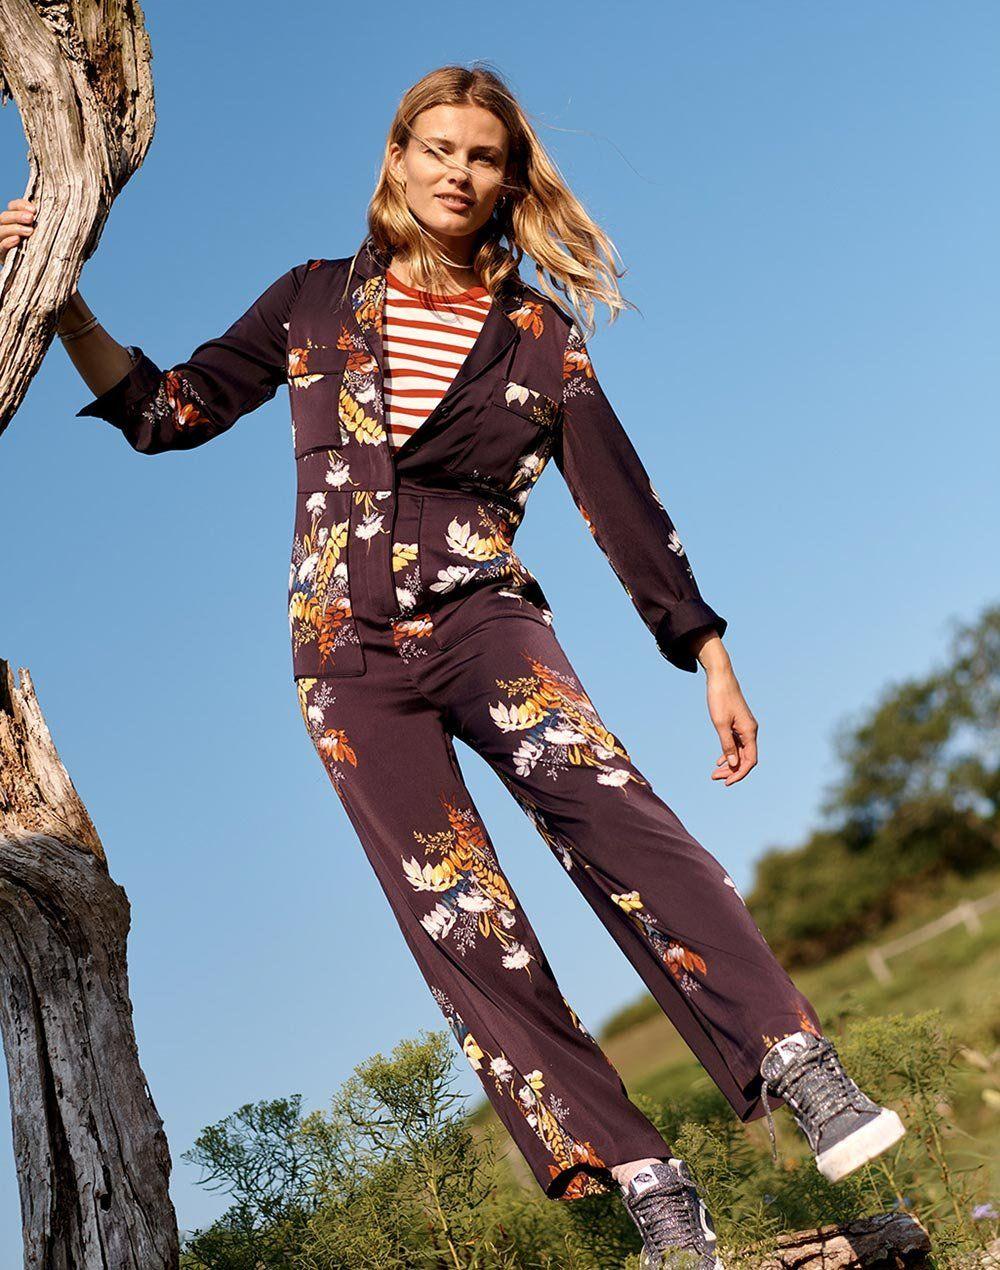 aa14a31b2560 madewell satin pajama jumpsuit worn with northside vintage tee + vans  high-top sneakers.